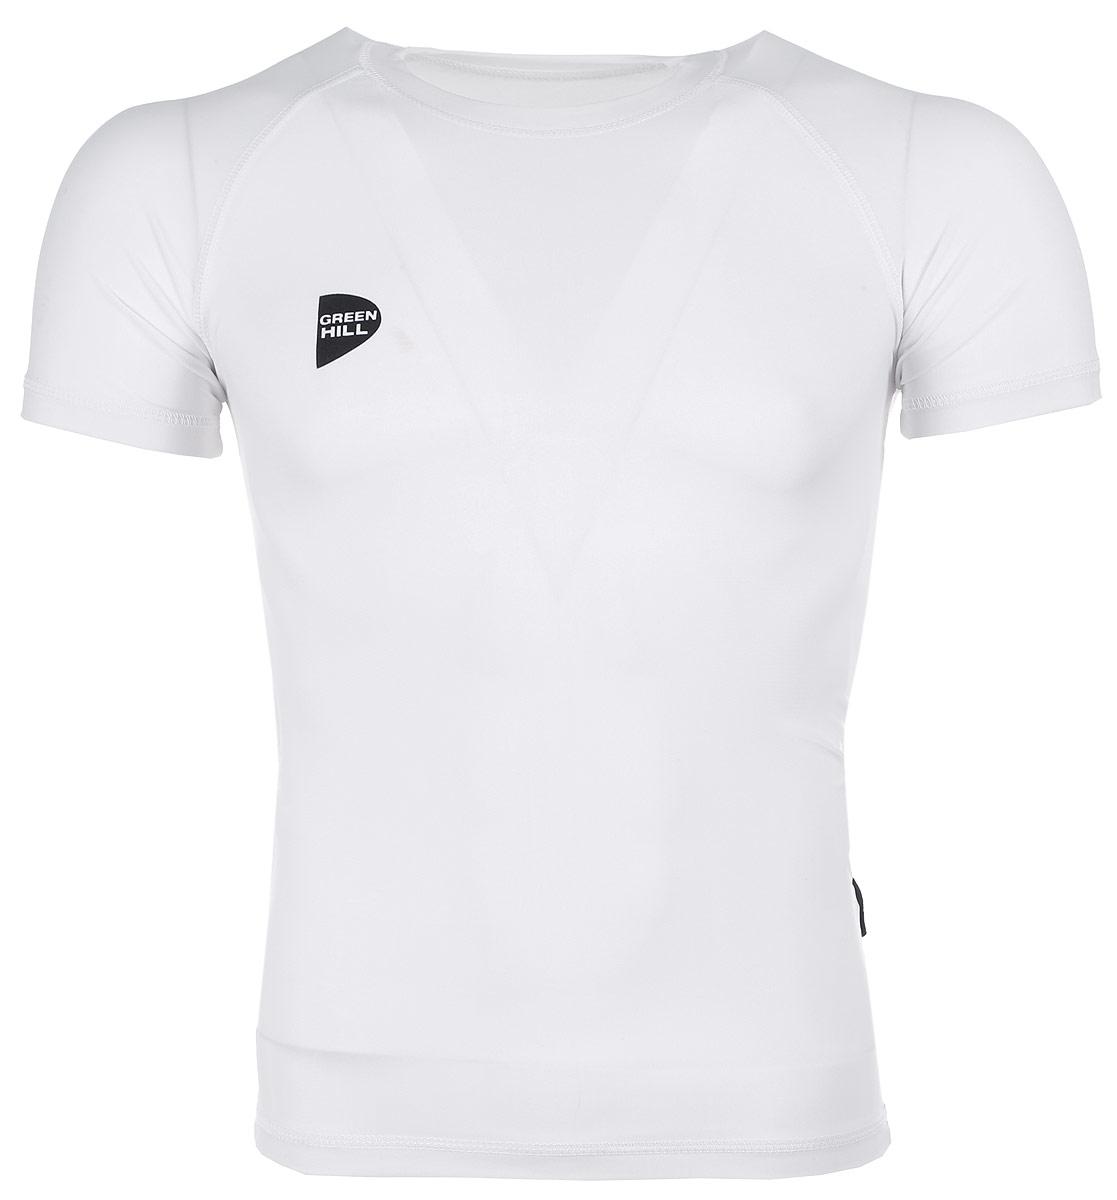 Защитная футболка Green Hill, цвет: белый. Размер XL. RGS-3558fSL524104Защитная футболка с длинным рукавом. Материал: полиэстер/лайкра. Размеры: Длина 69 см ширина 45 см длина рукава от плечевого шва 64 см